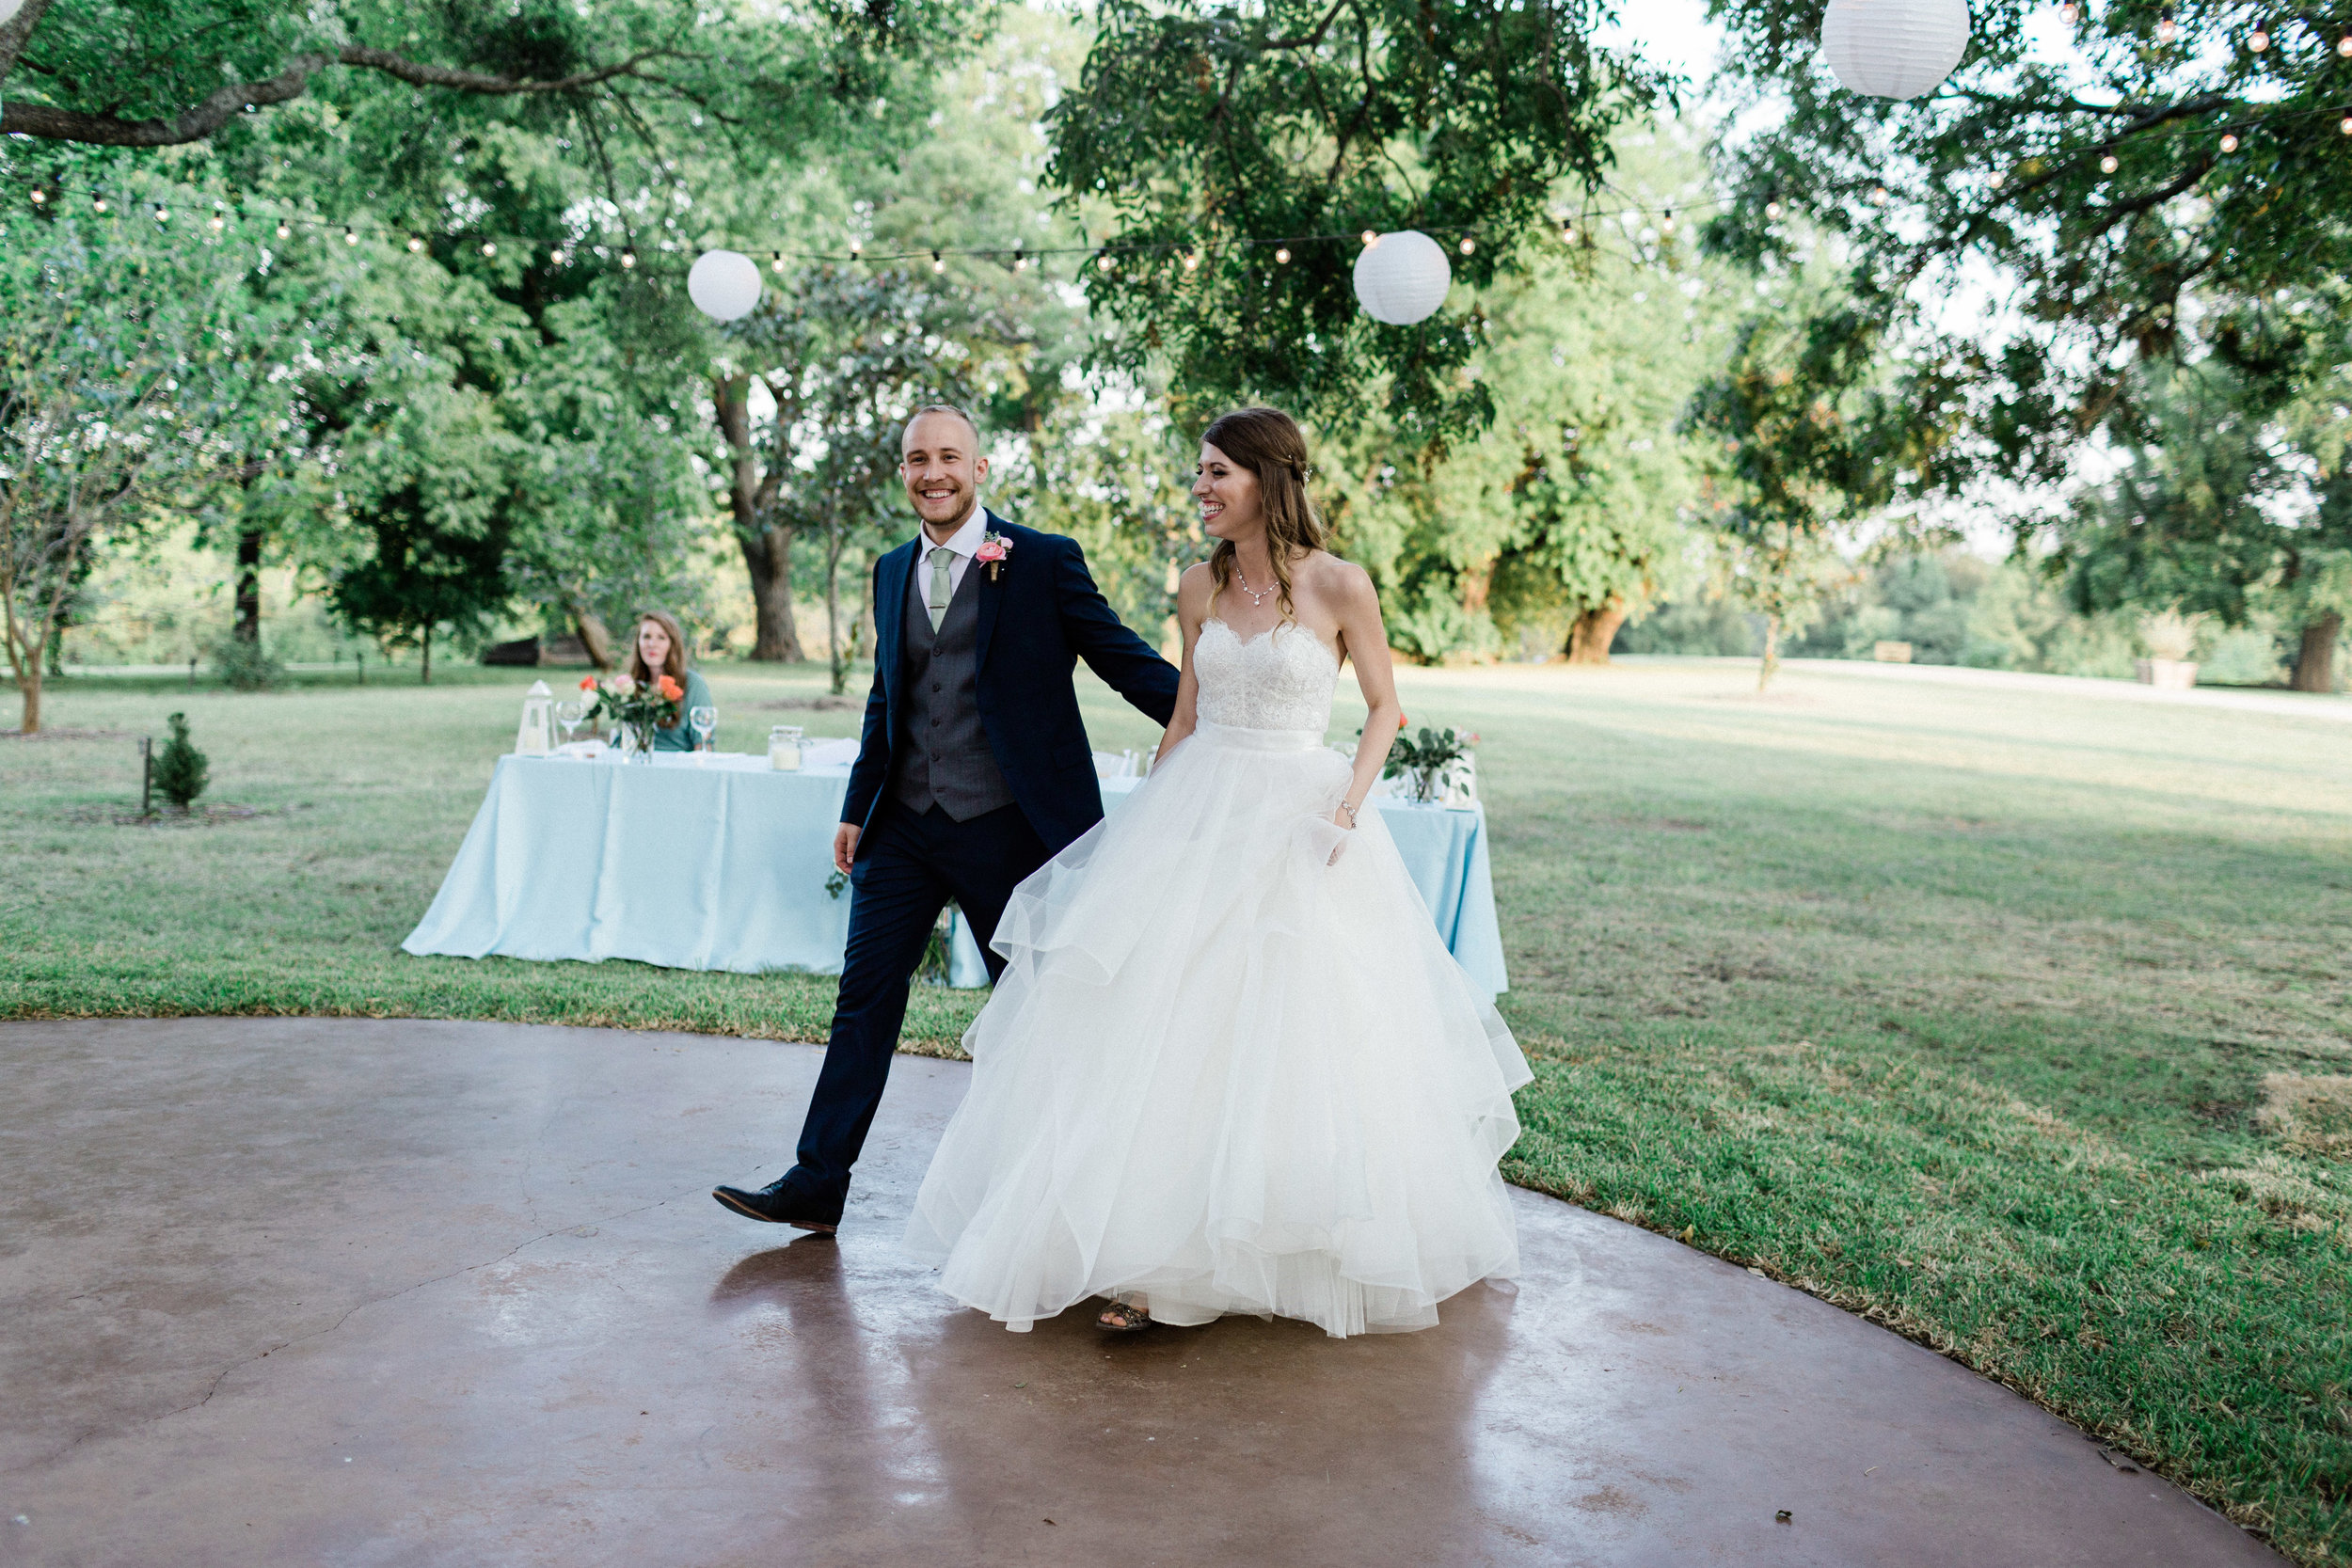 Wedding reception at Chandlers gardens